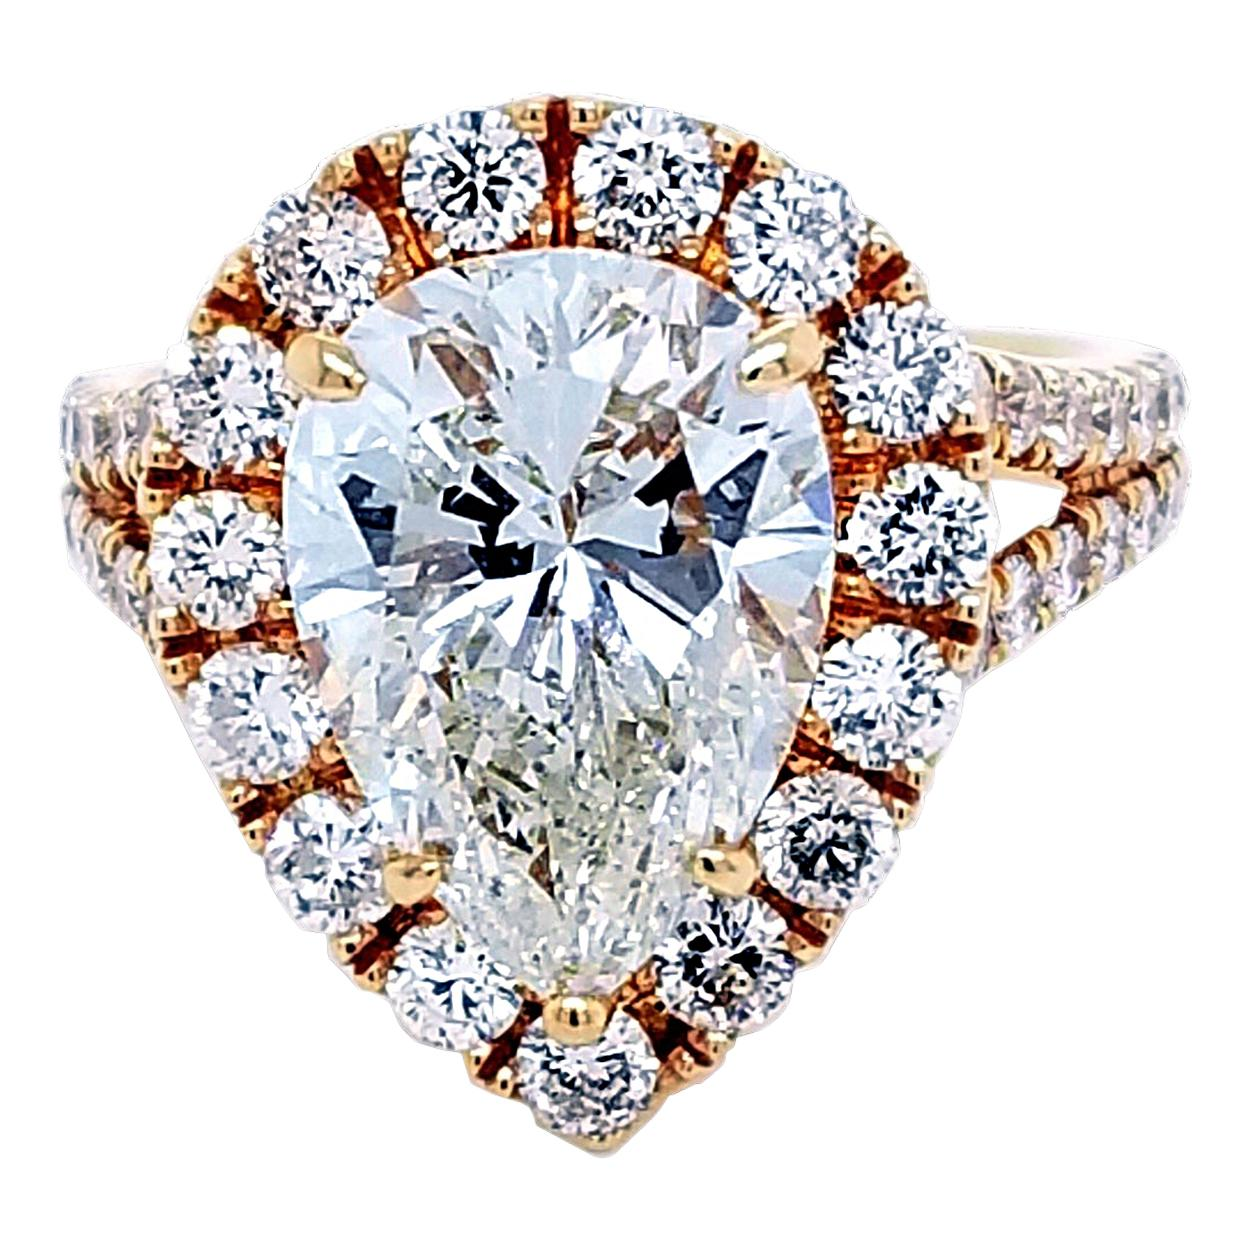 EGL 4.01Ct Pear Shape Diamond 18K Split Shank Pave Set Engagement Ring with Halo